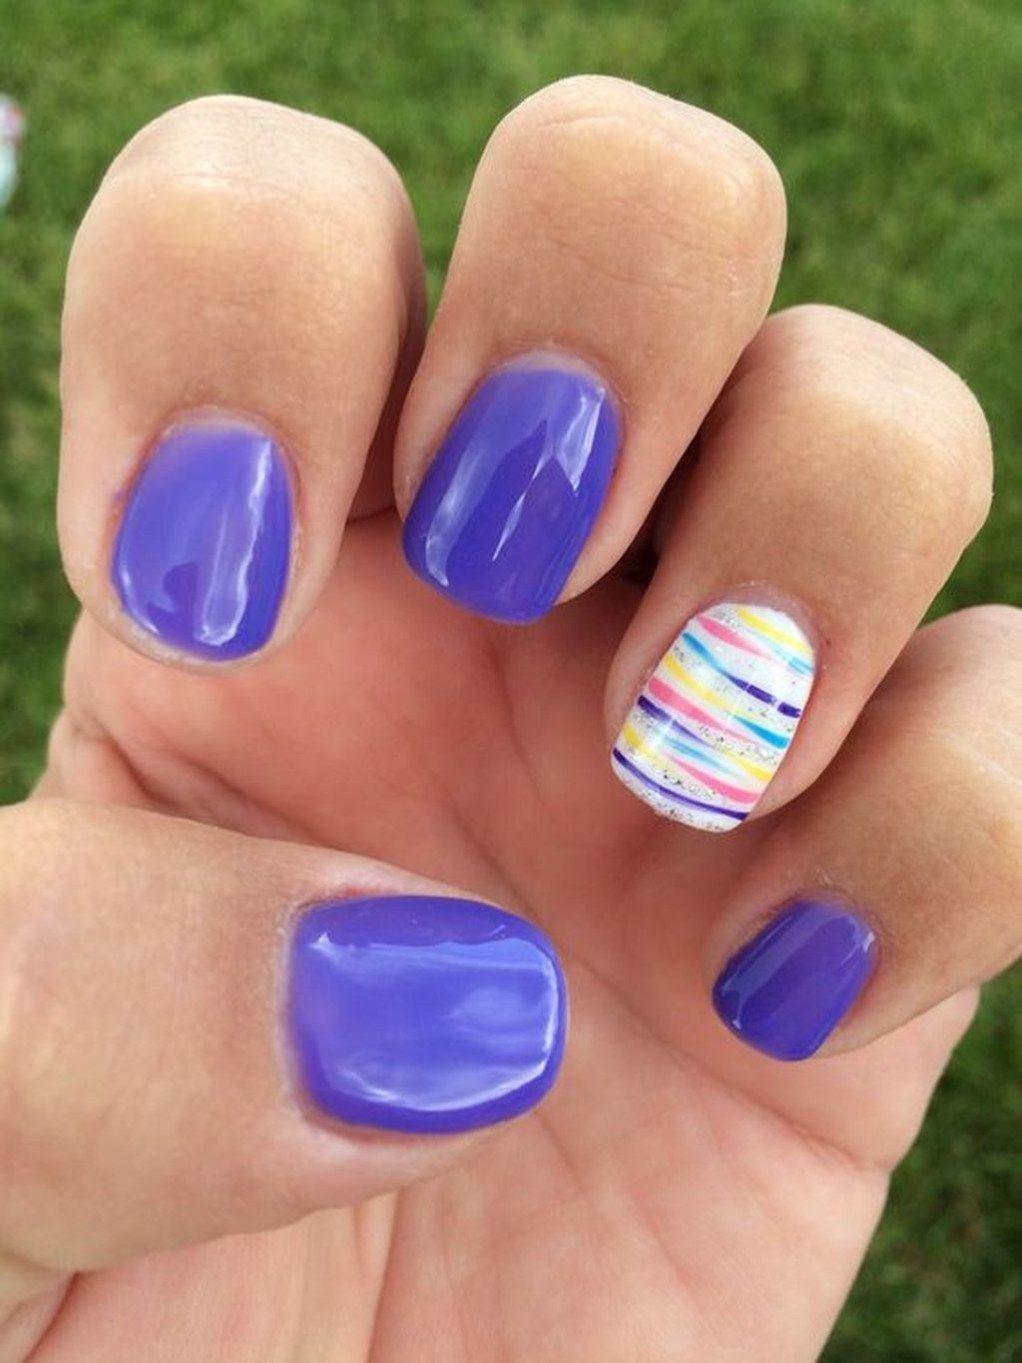 Cute summer nails designs ideas nails in pinterest